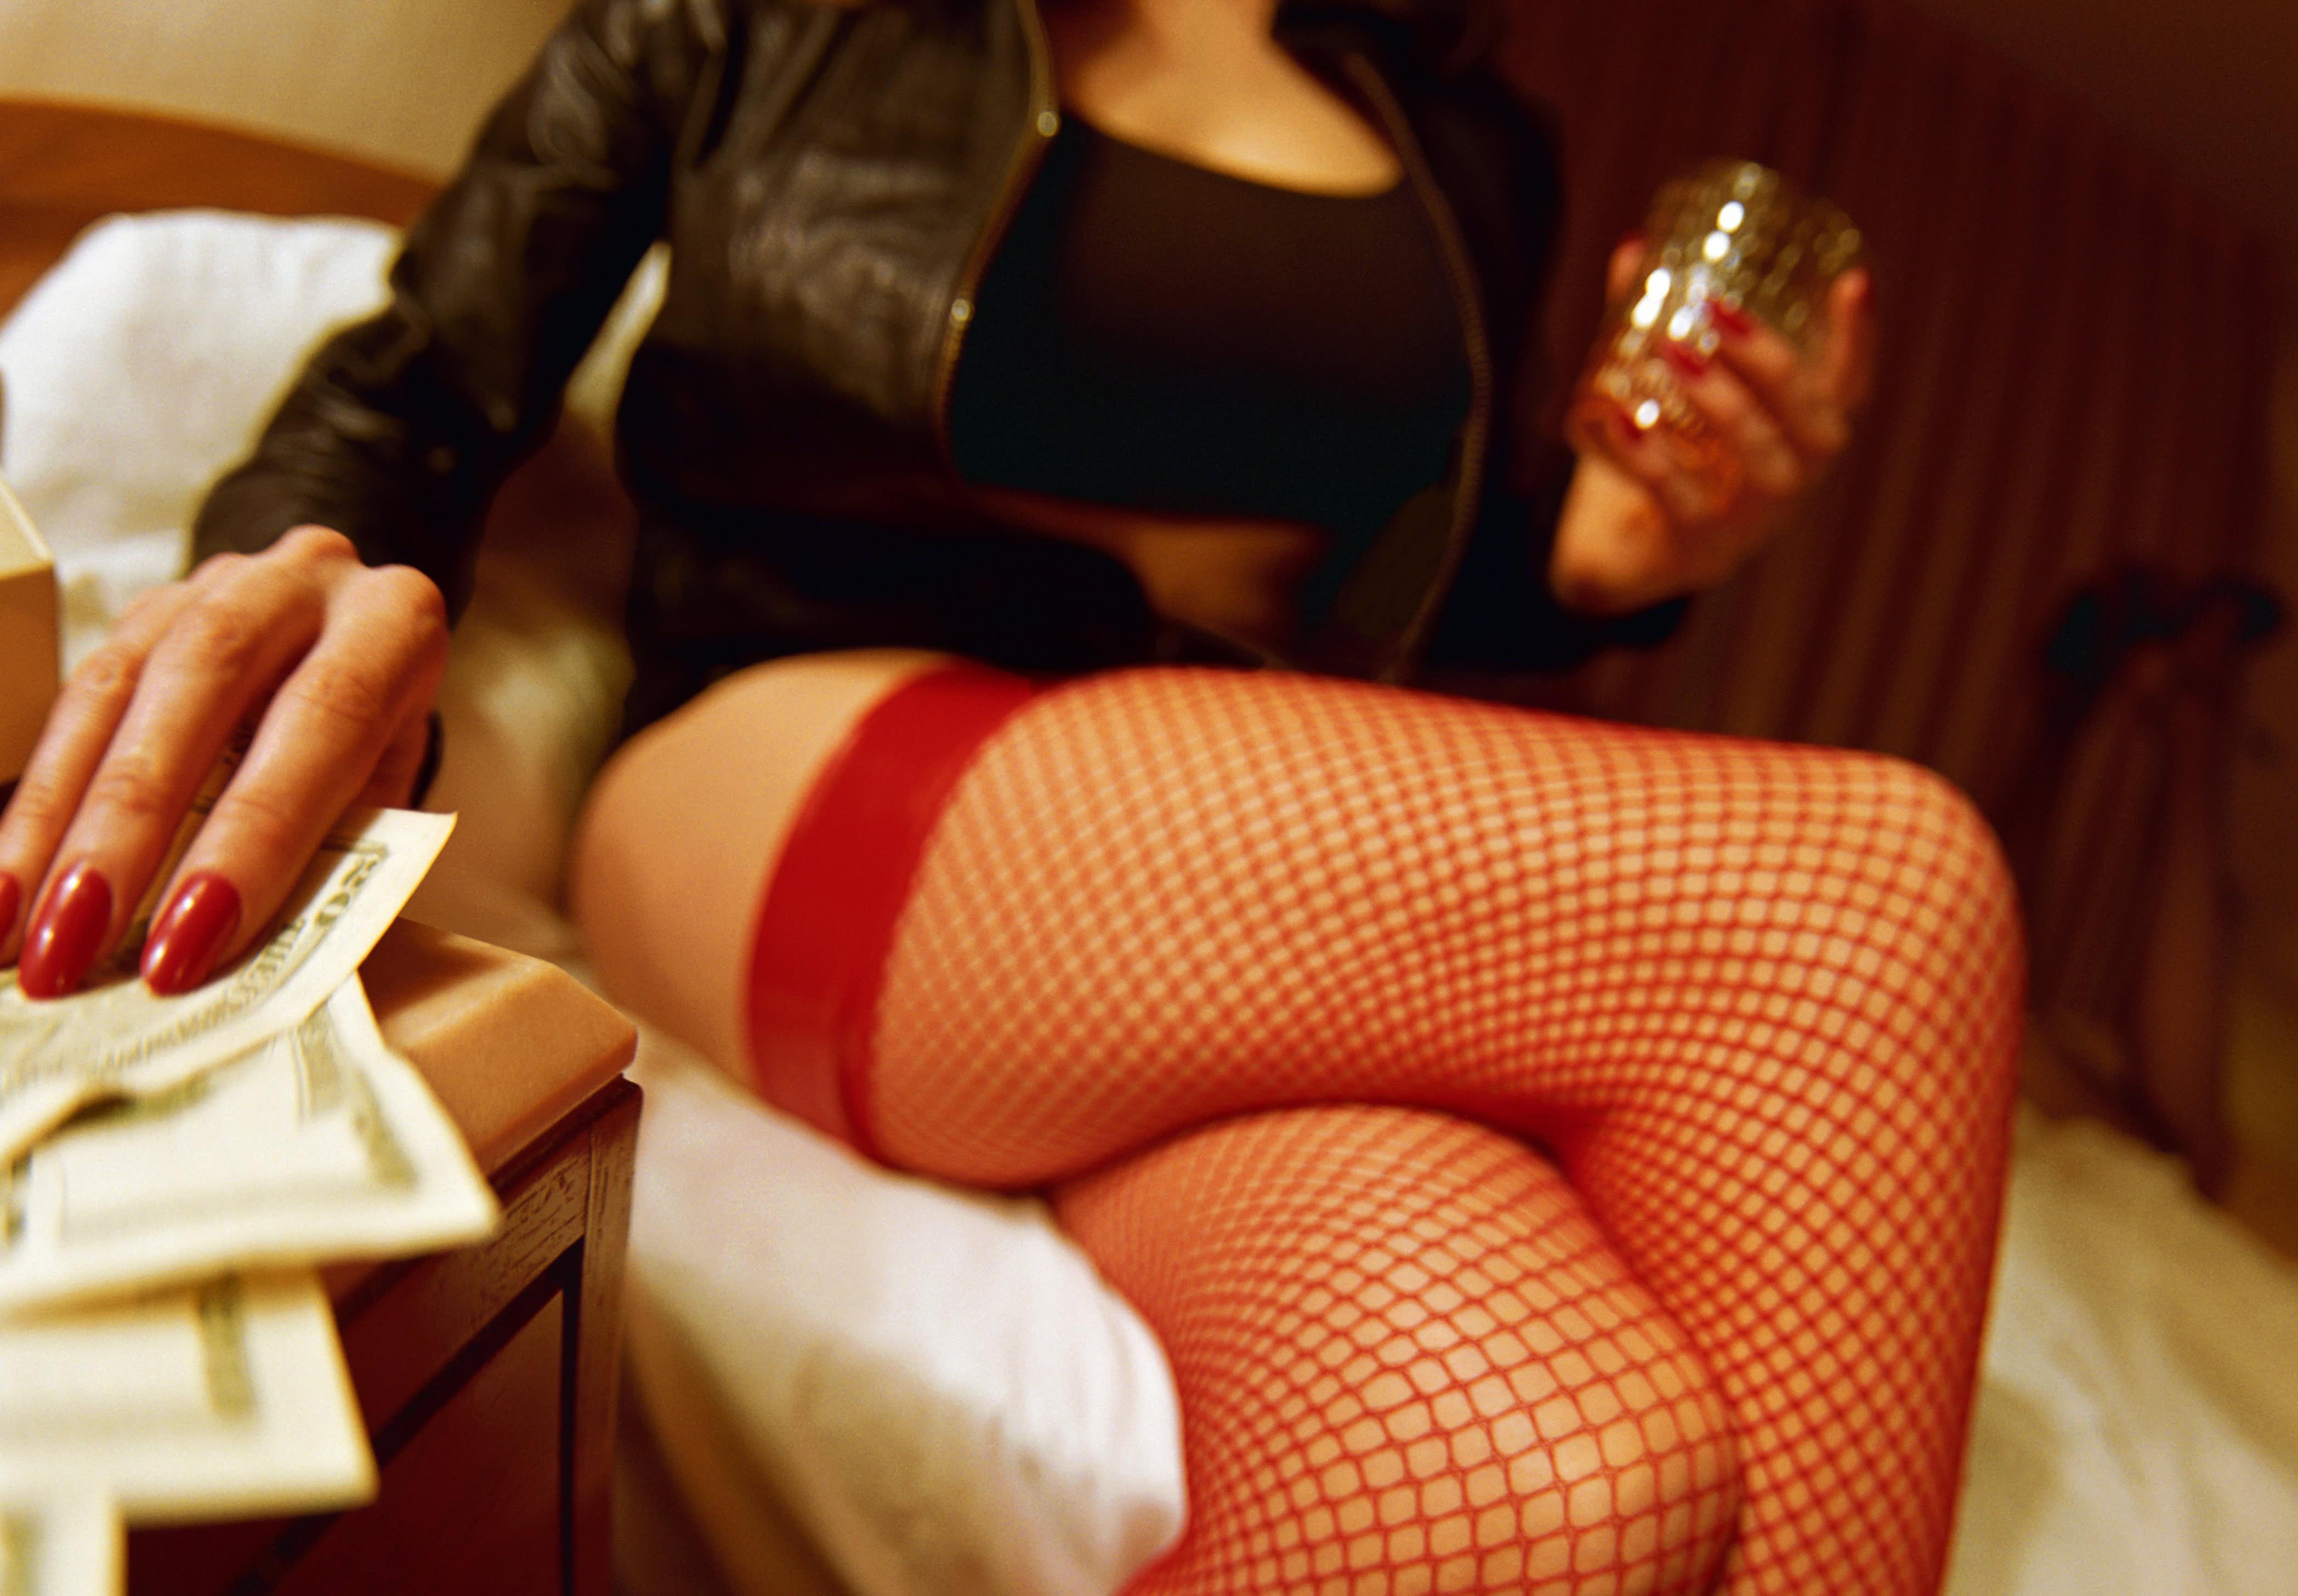 Я помогаю проституткам шлюхи в Тюмени ул Хохрякова